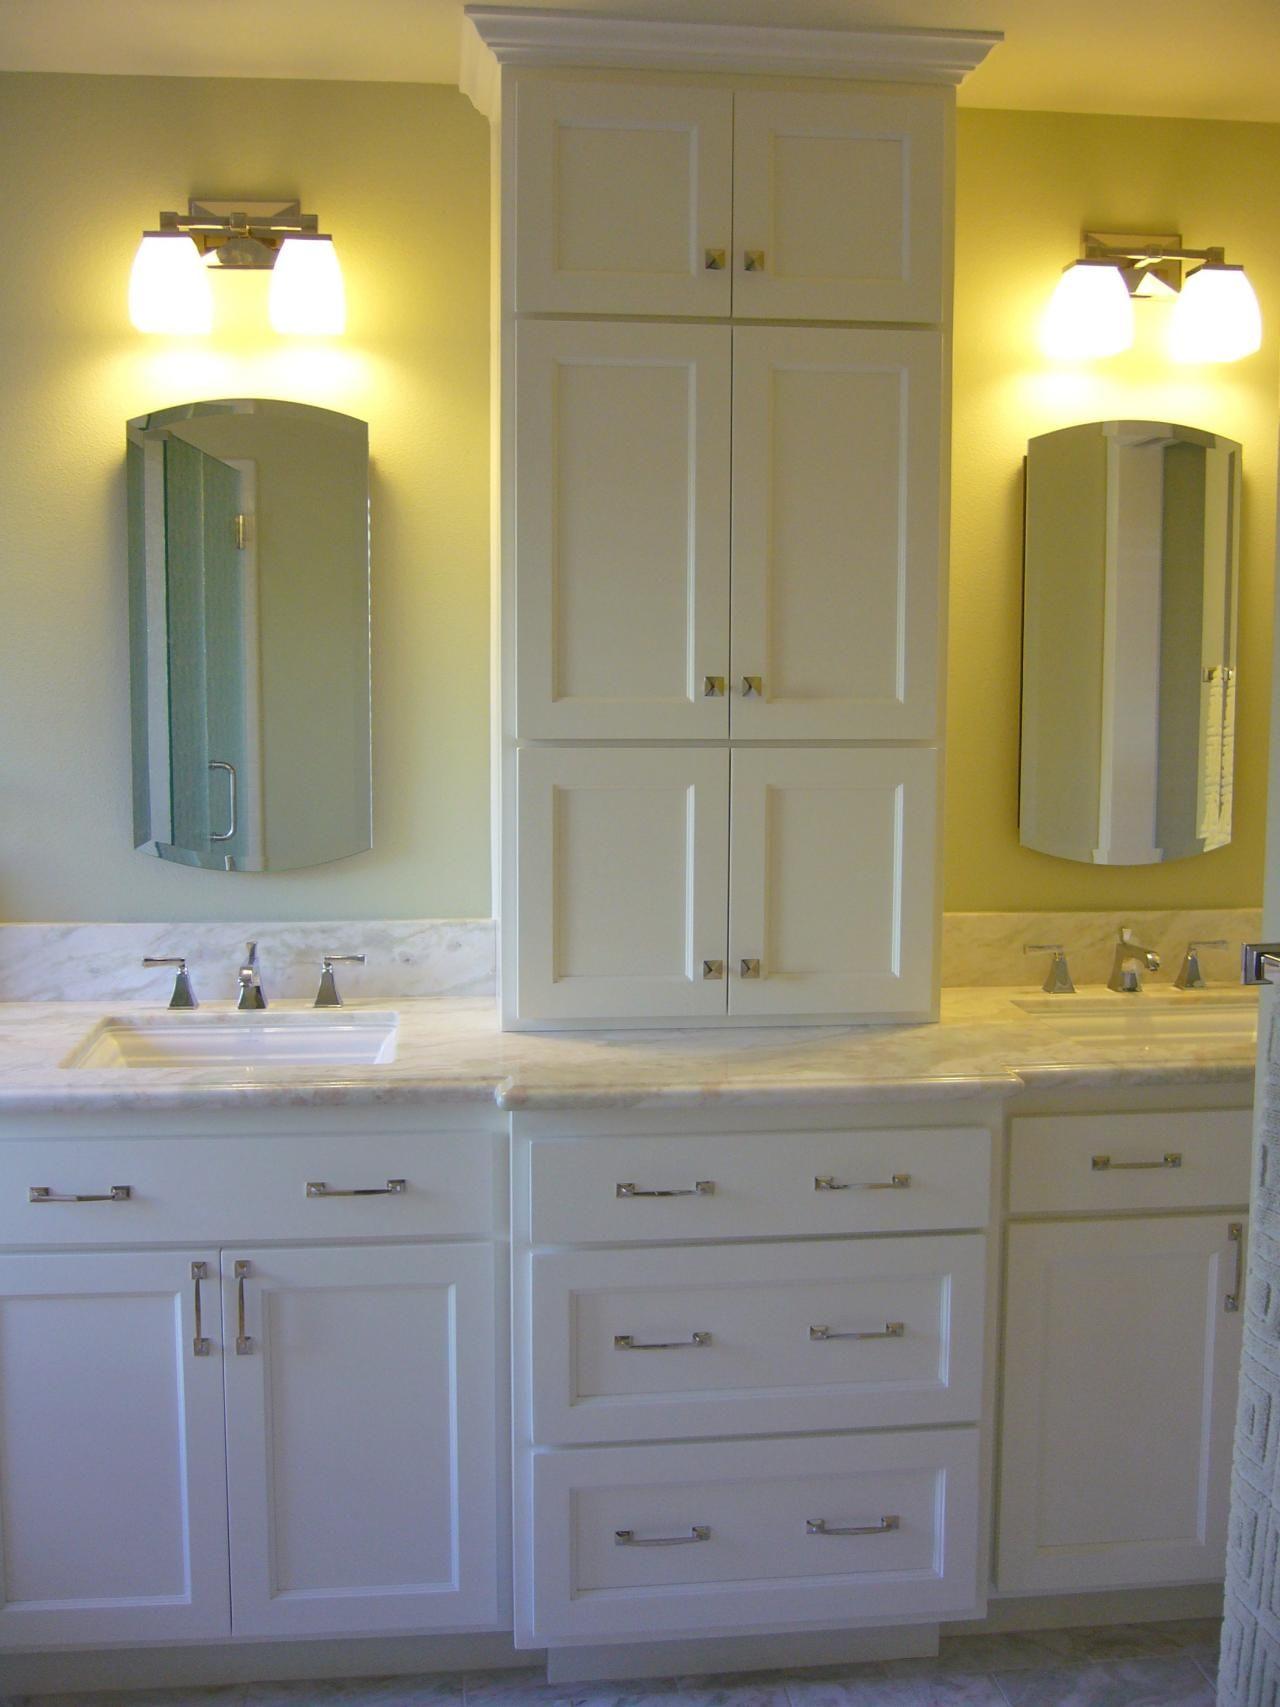 Bathroom Vanities for Any Style Hgtv Bathroom Vanities and Vanities